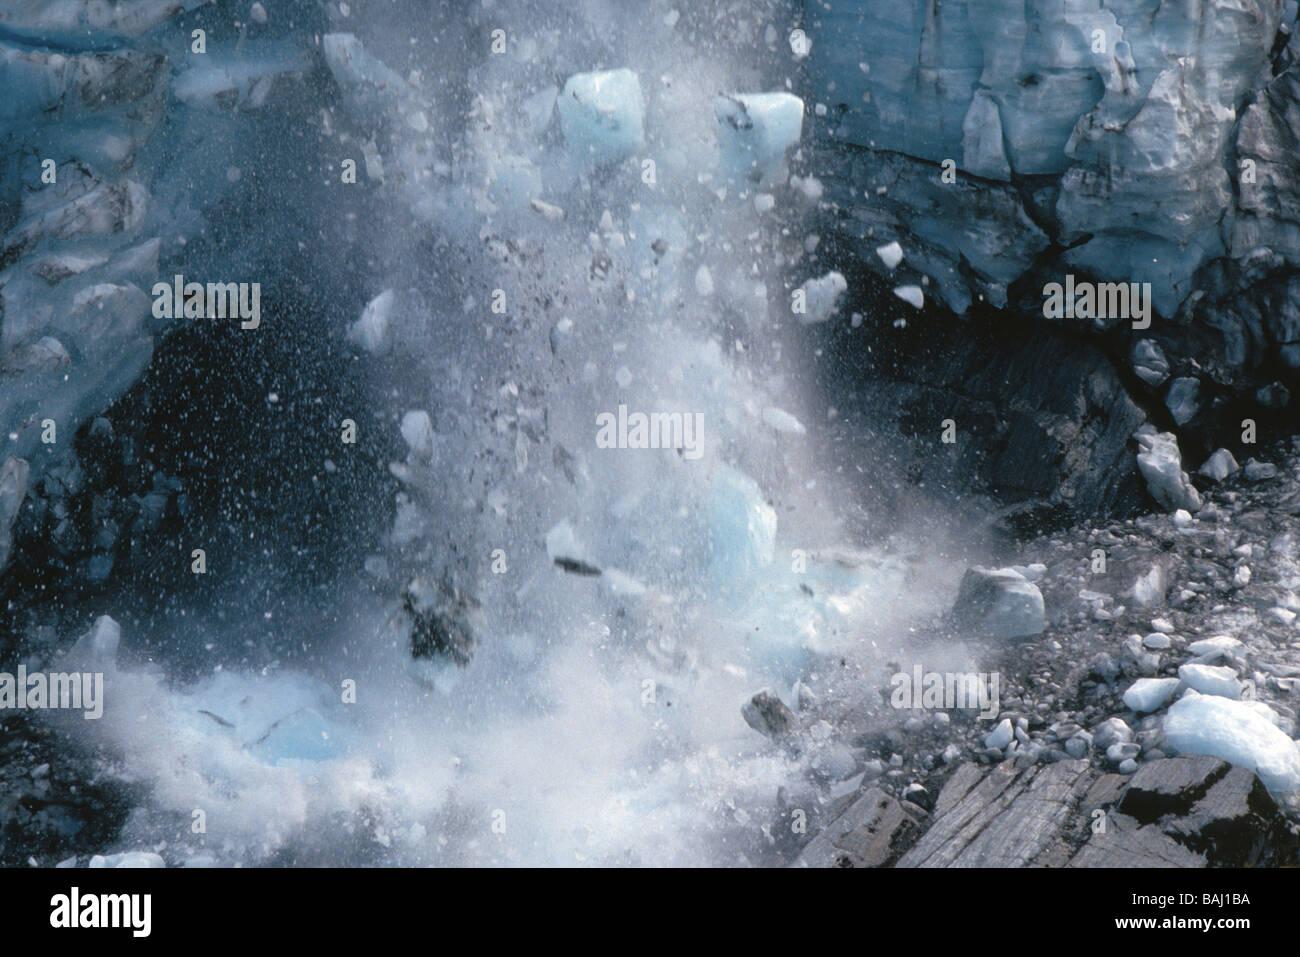 Eisfall am Franz Josef Gletscher auf der Nordinsel Neuseelands Stockbild